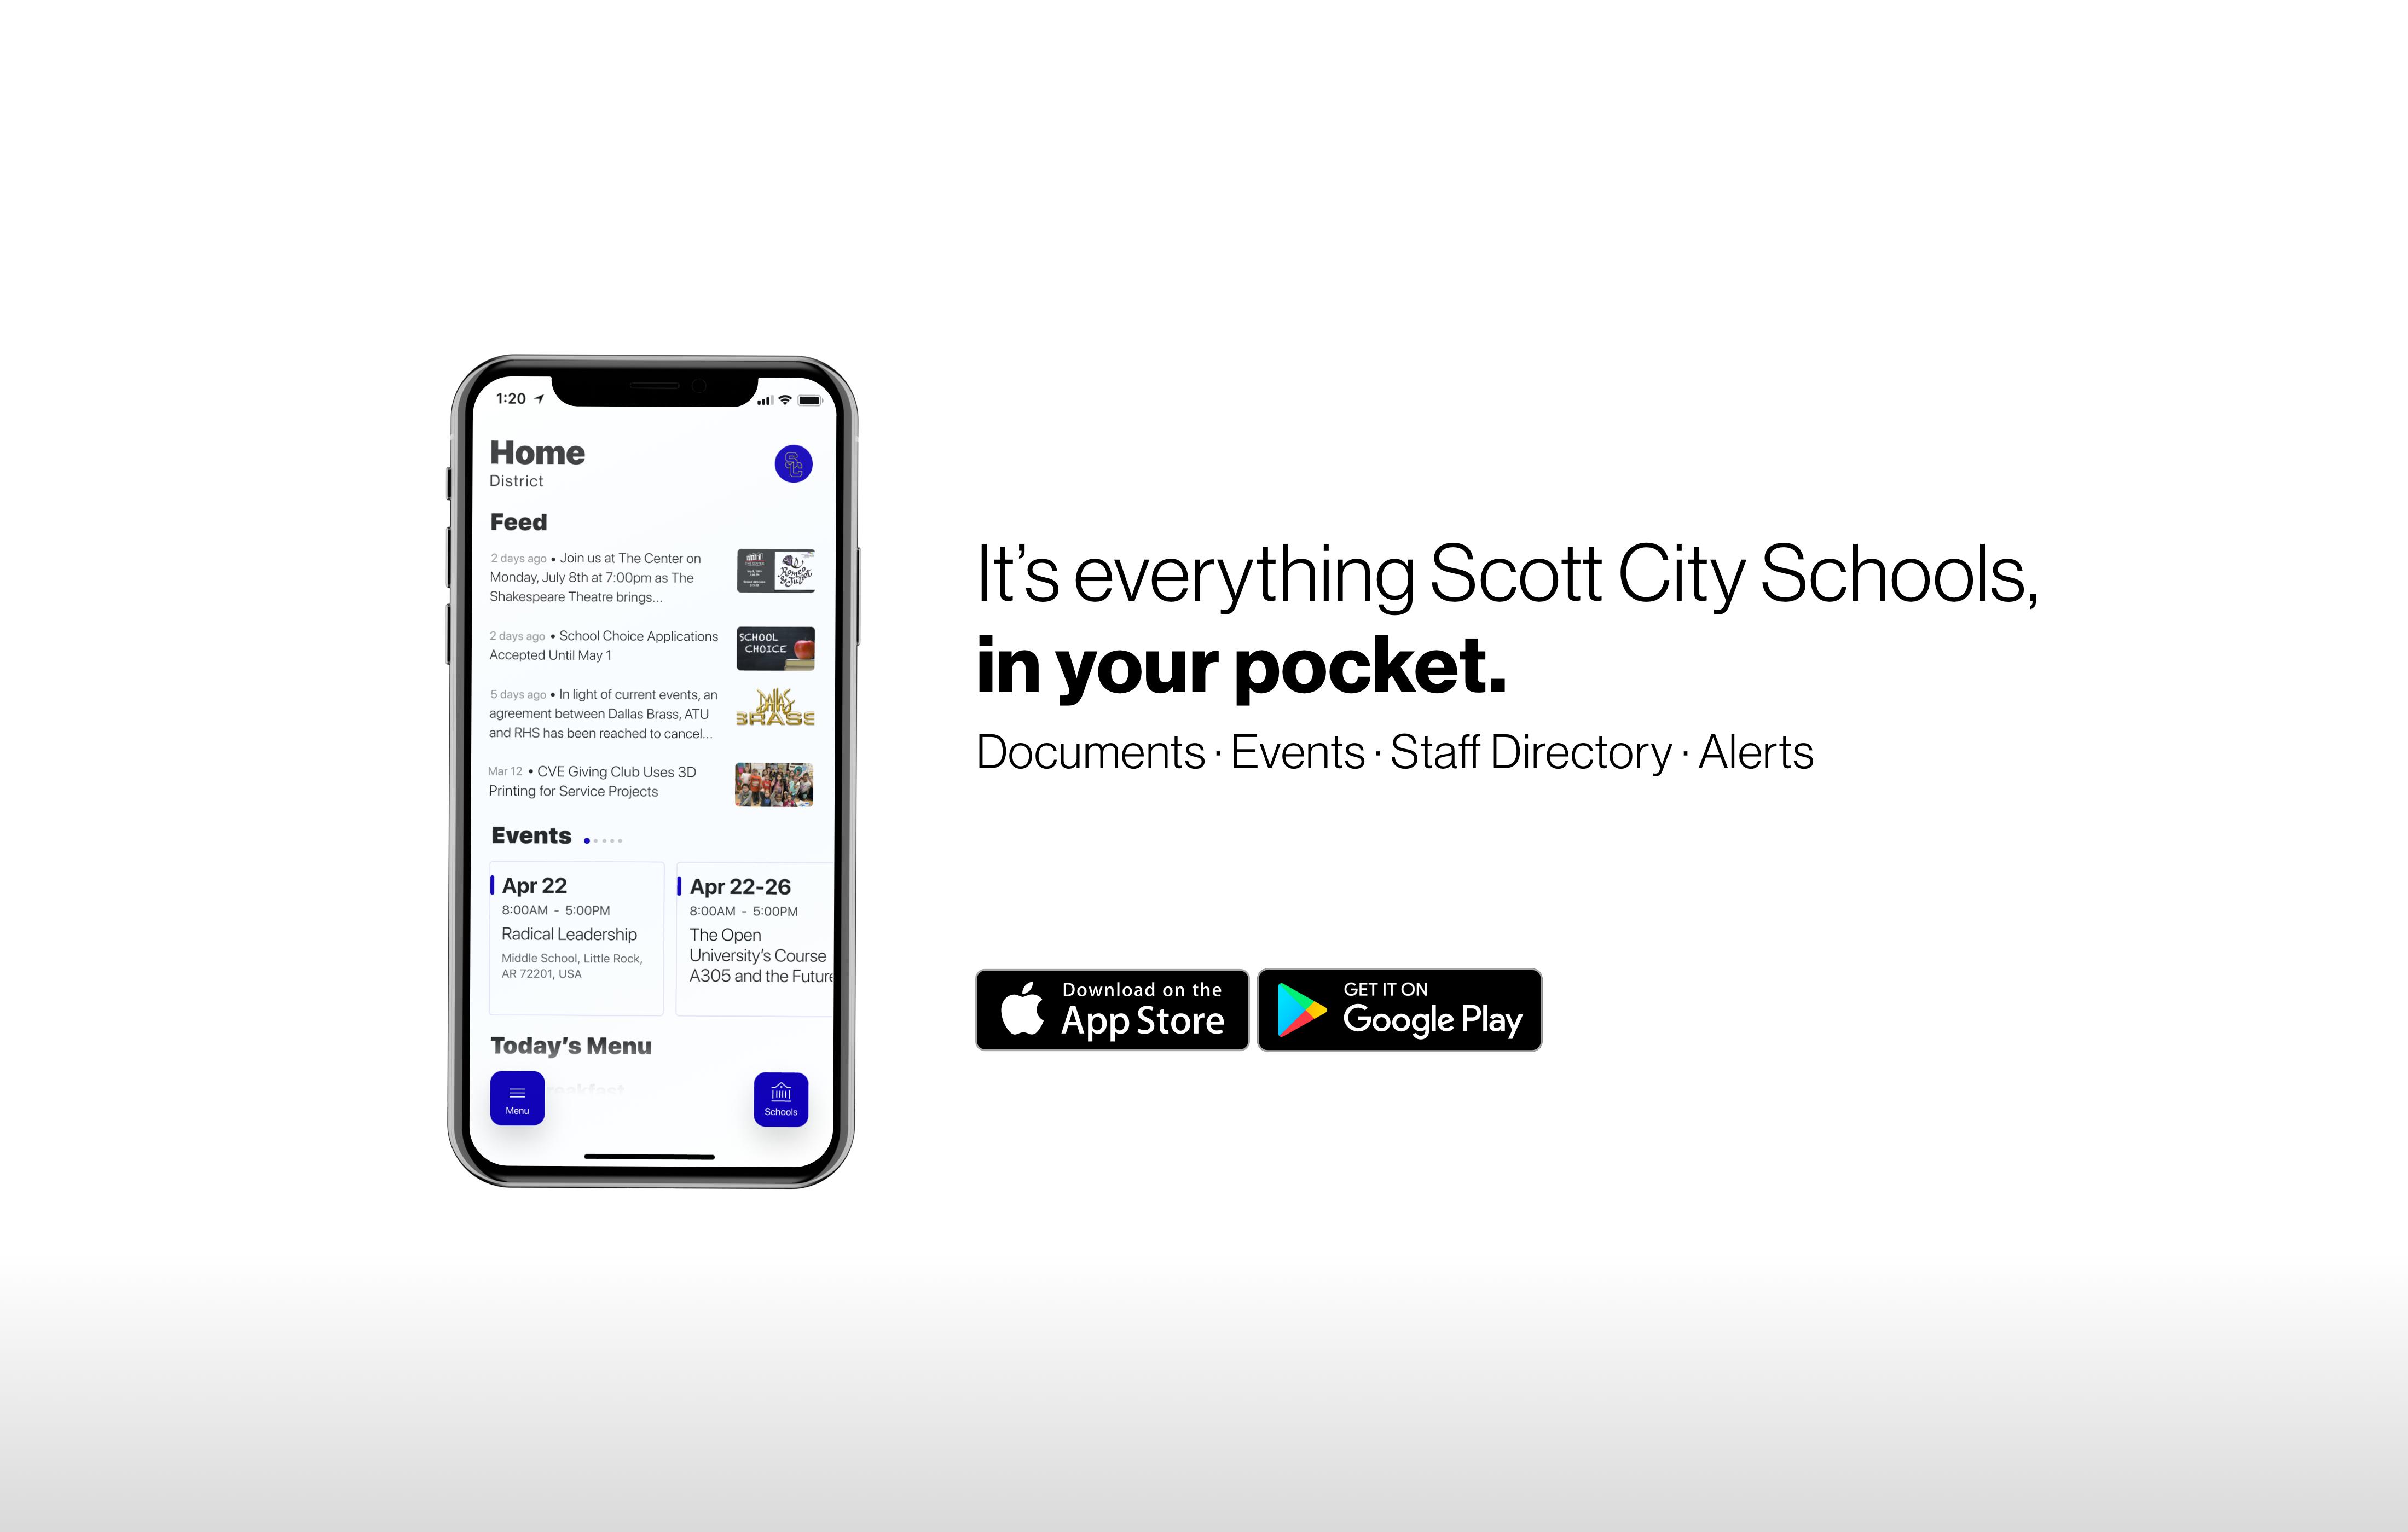 Scott City App Advertisement